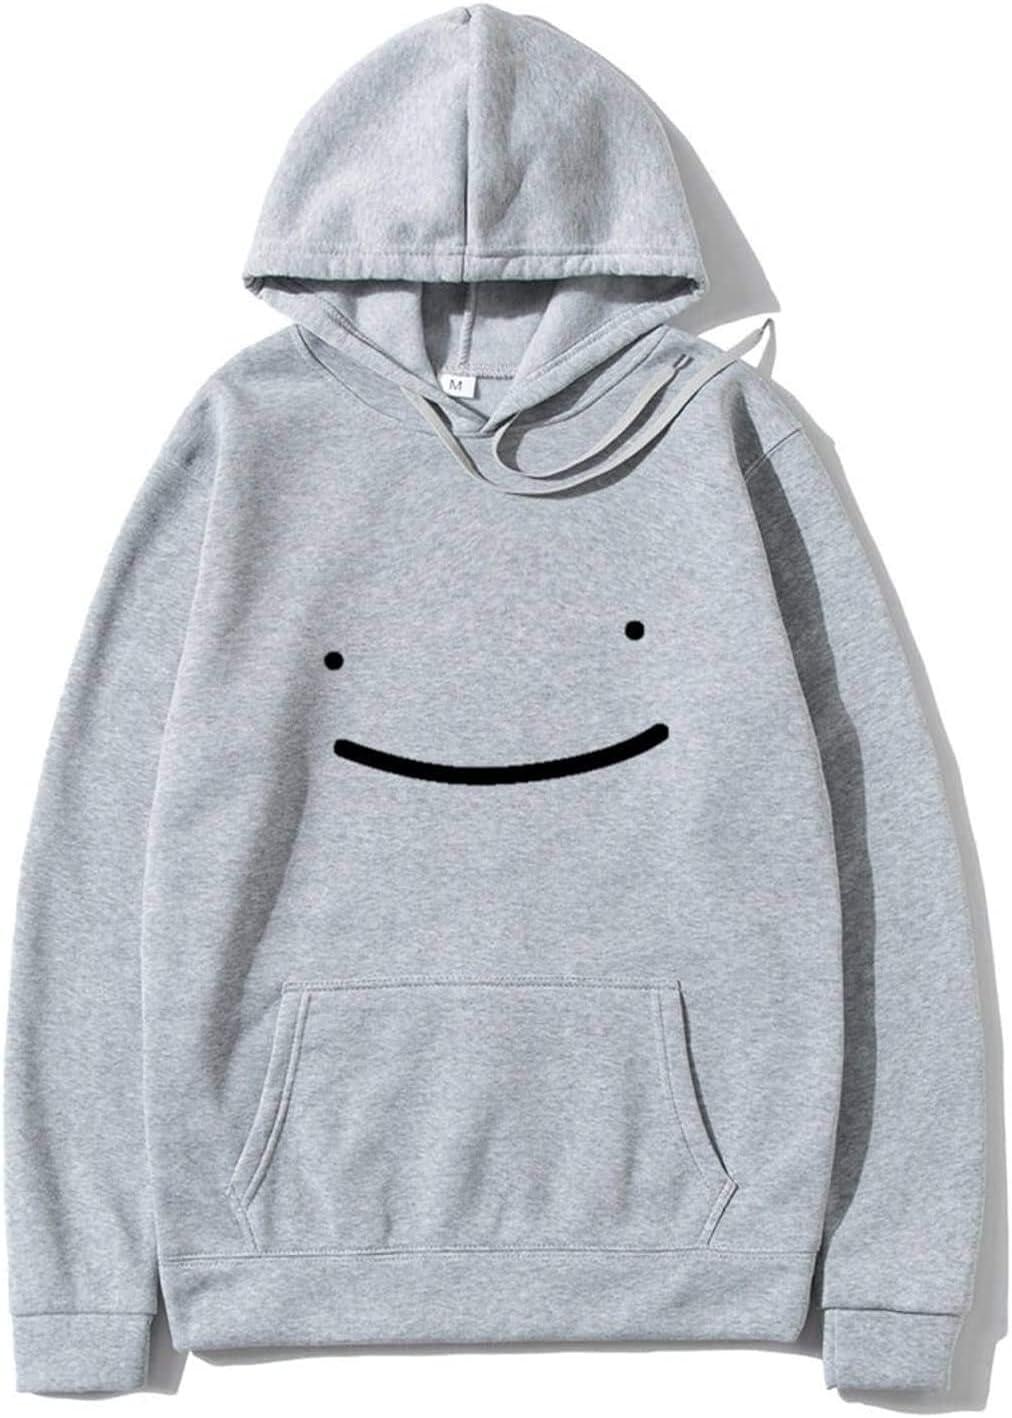 MAORR Cartoon Hooded Sweater, Moletom Com Capuz Moletom Masculino Feminino Harajuku Pullover Moletom Streetwear Moda Casual Roupas Grandes (Color : 19, Size : -S)